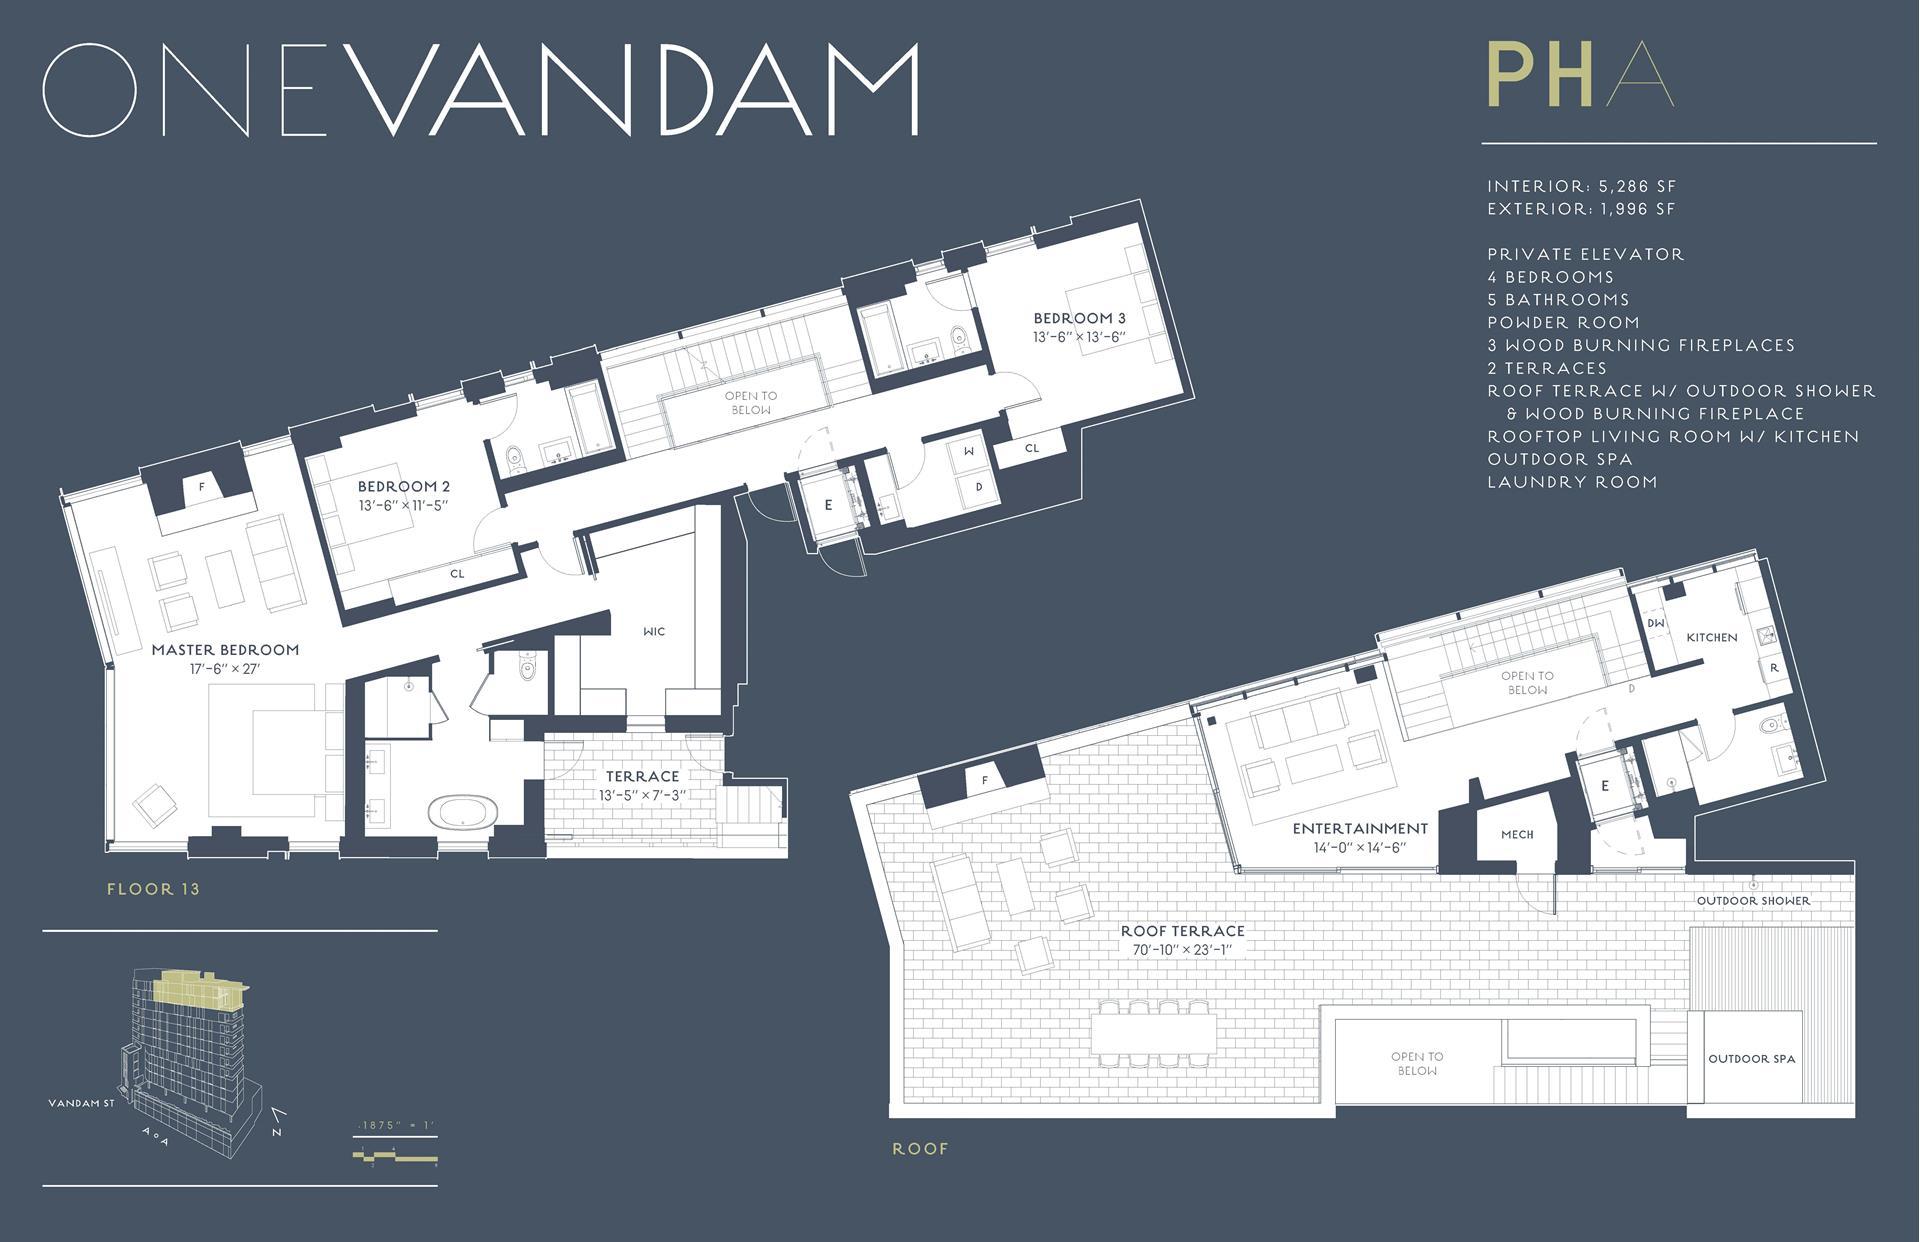 Floor plan of One Vandam, 180 Sixth Avenue, PENTHOUSEA - SoHo - Nolita, New York